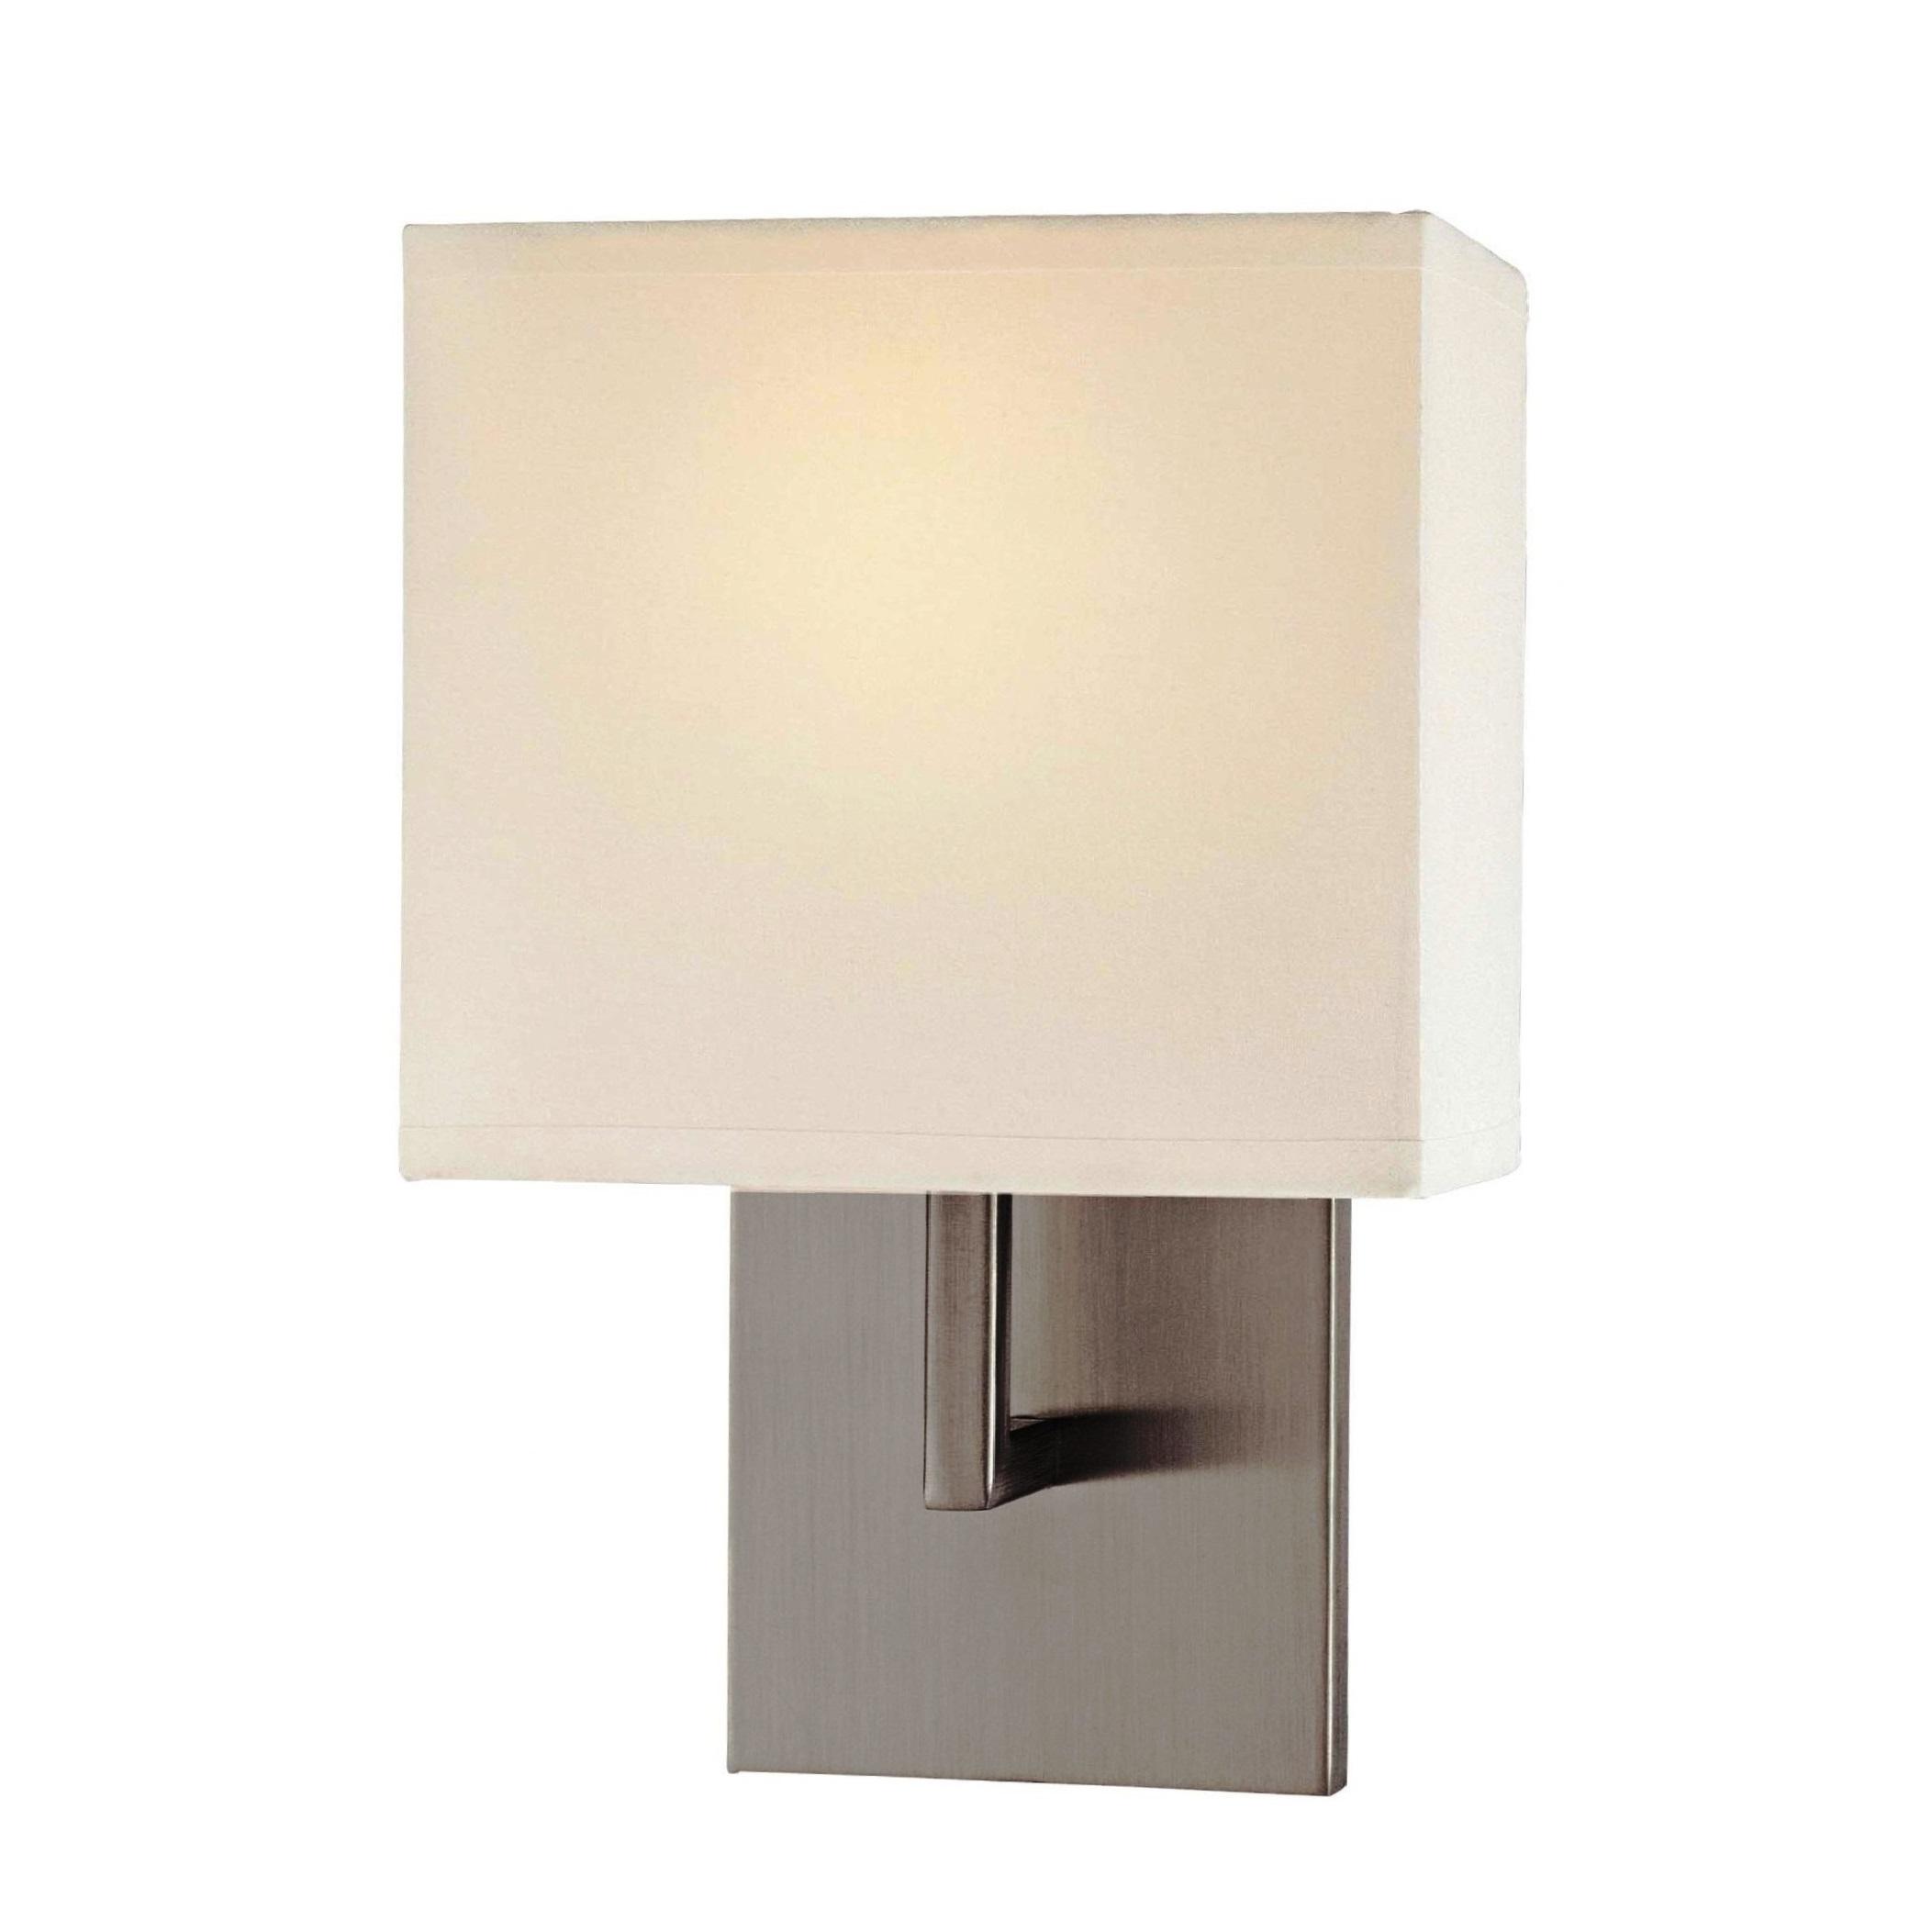 george kovacs 1 light wall sconce in brushed nickel l. Black Bedroom Furniture Sets. Home Design Ideas